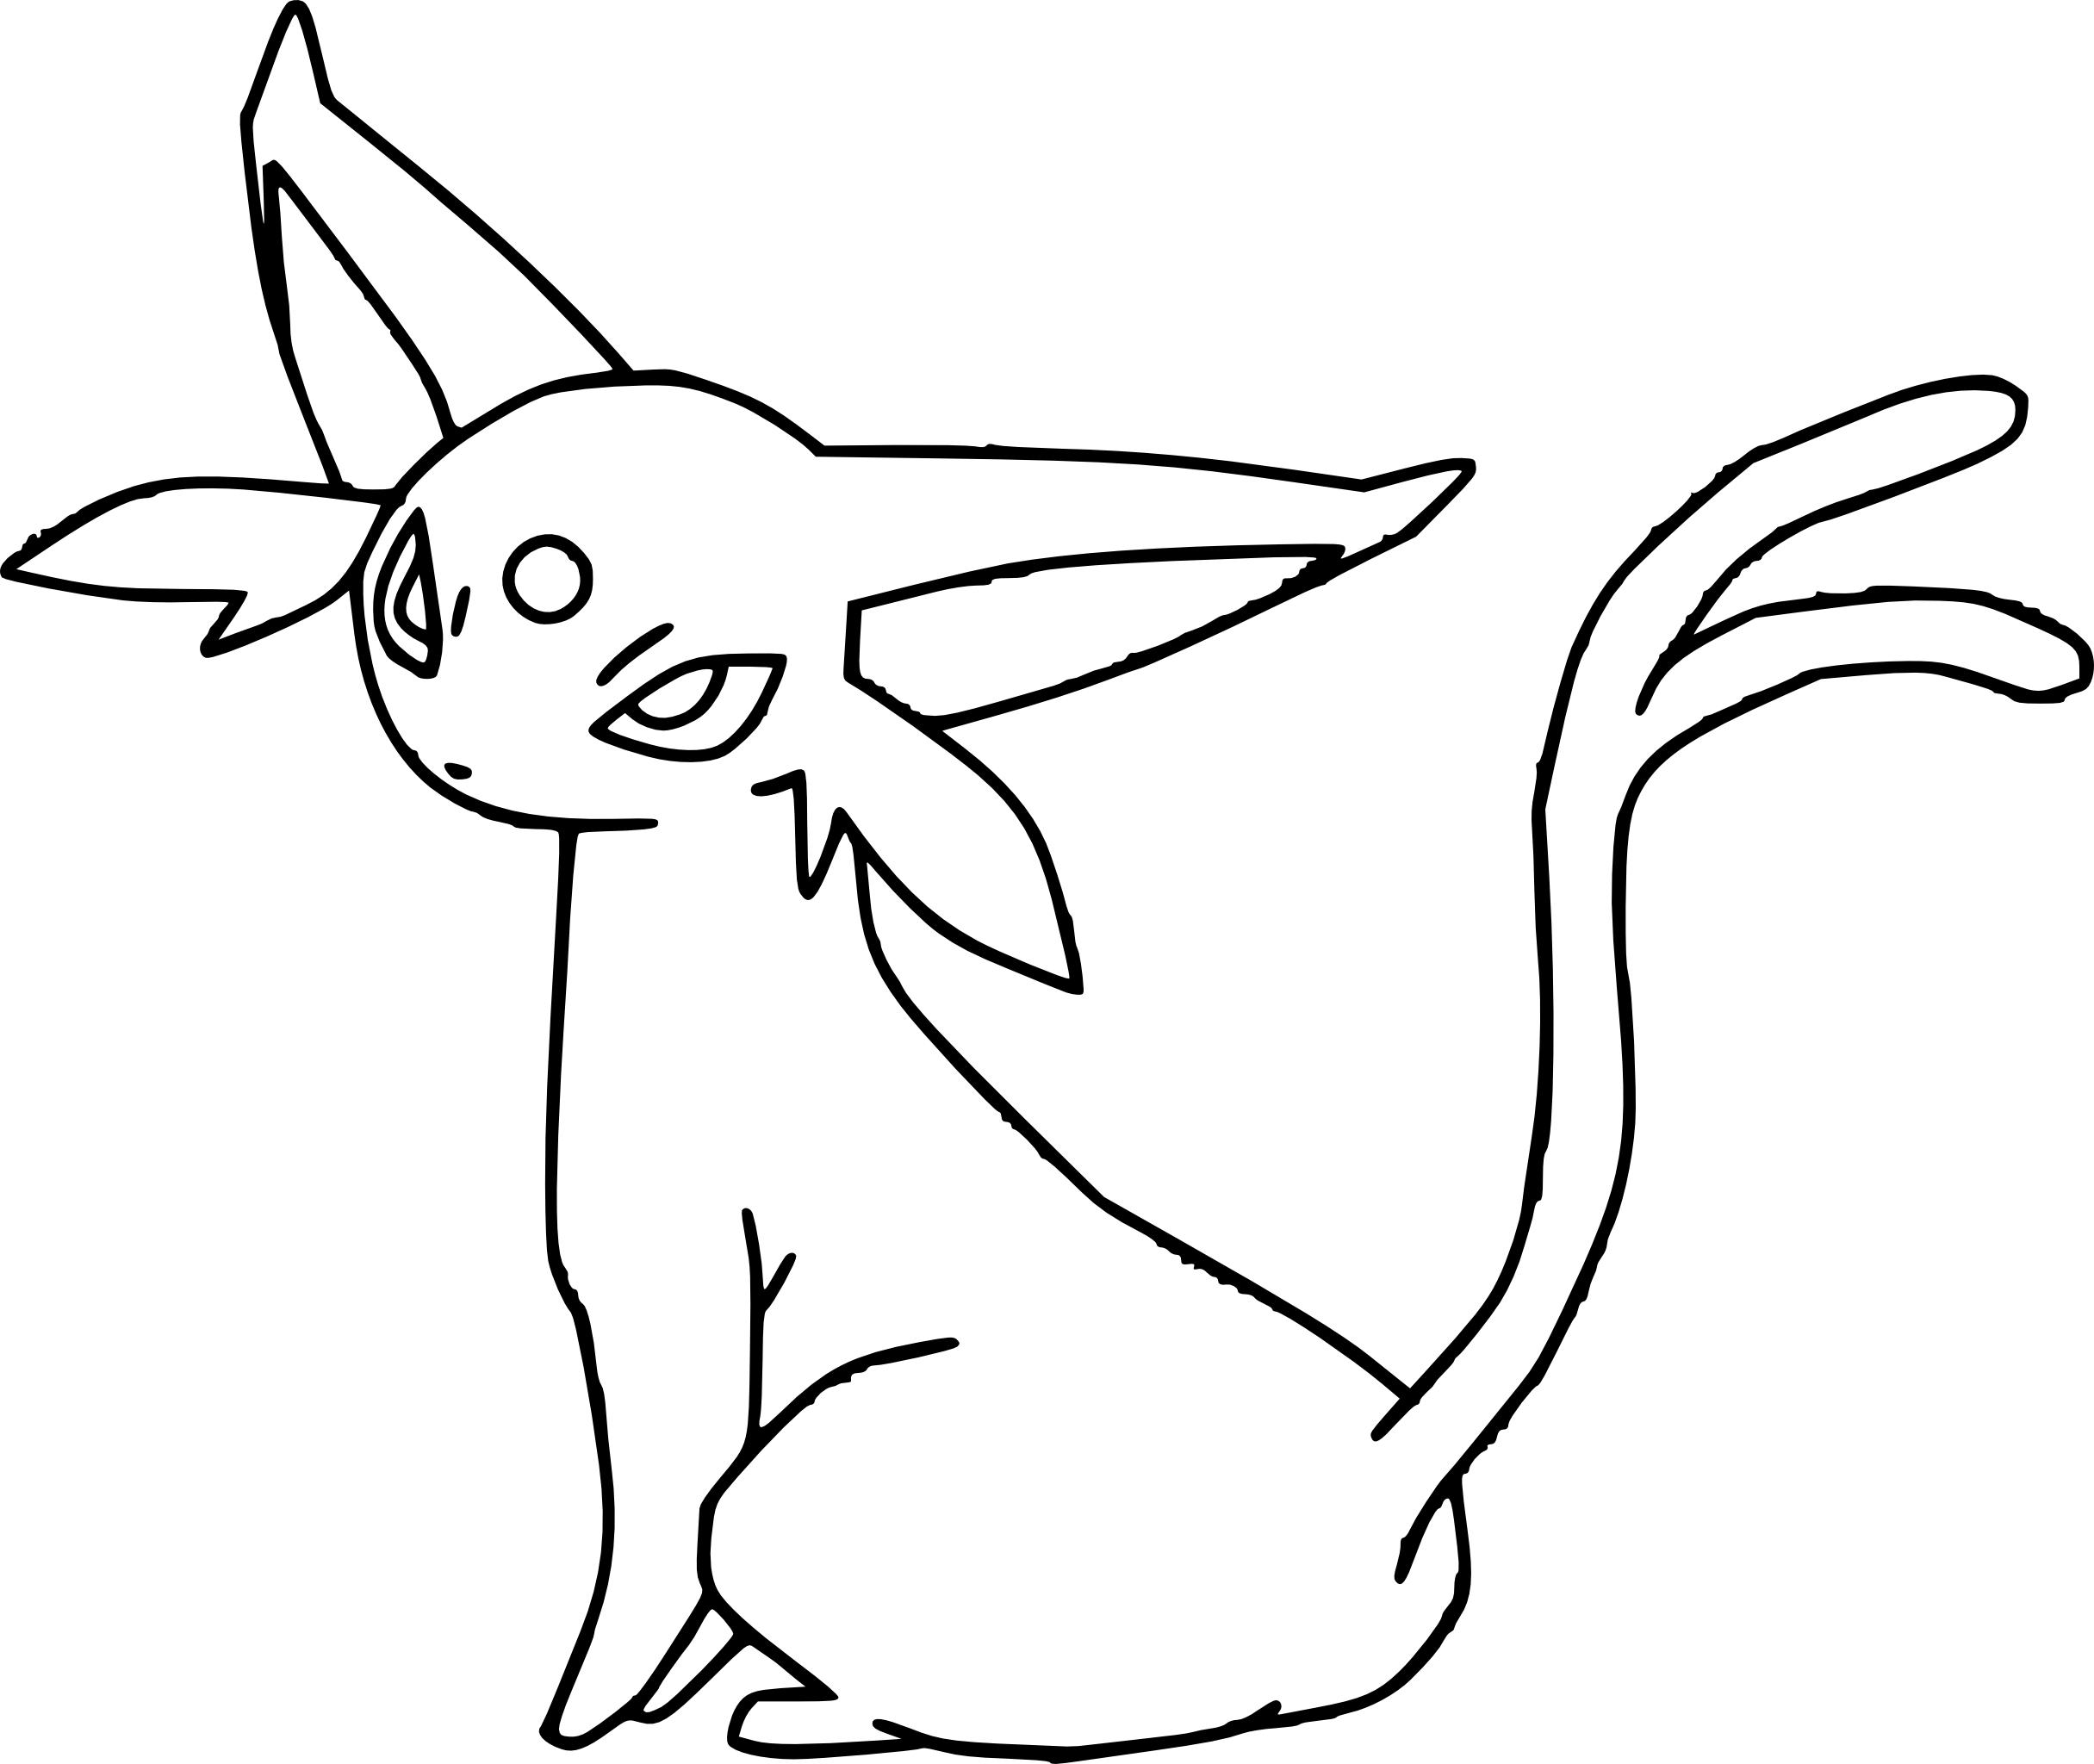 Unique dessin a imprimer pokemon pyroli - Pokemon gratuit ...